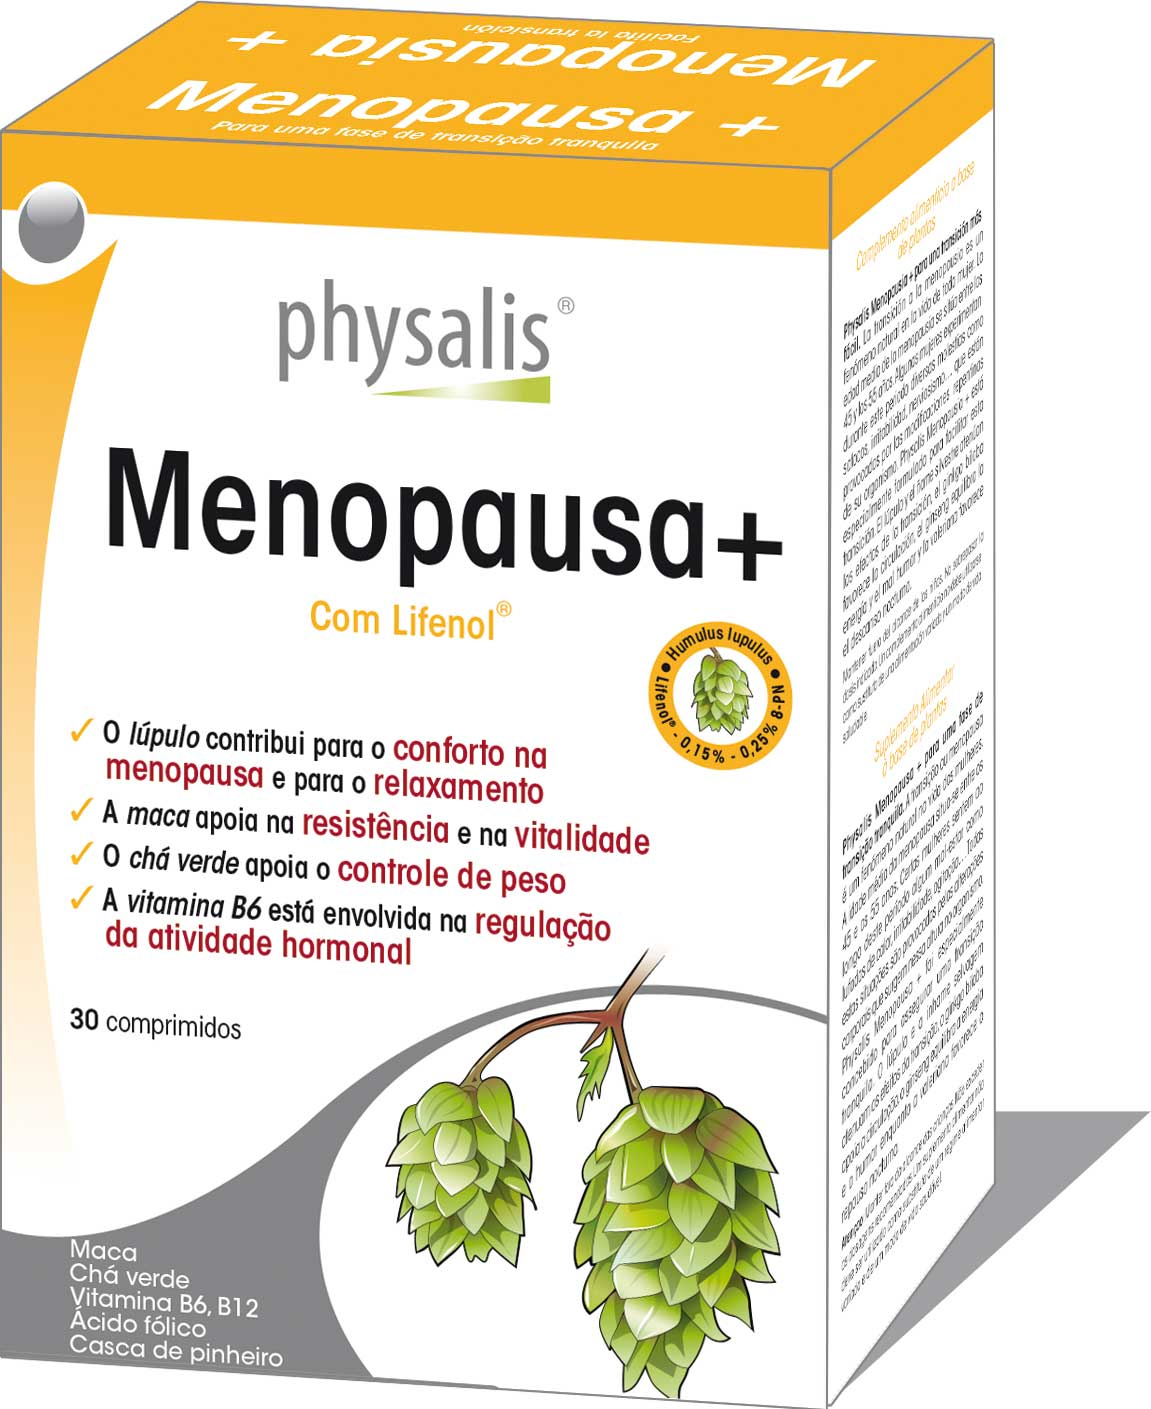 Menopausa  Keypharm Suplementos alimentares naturais